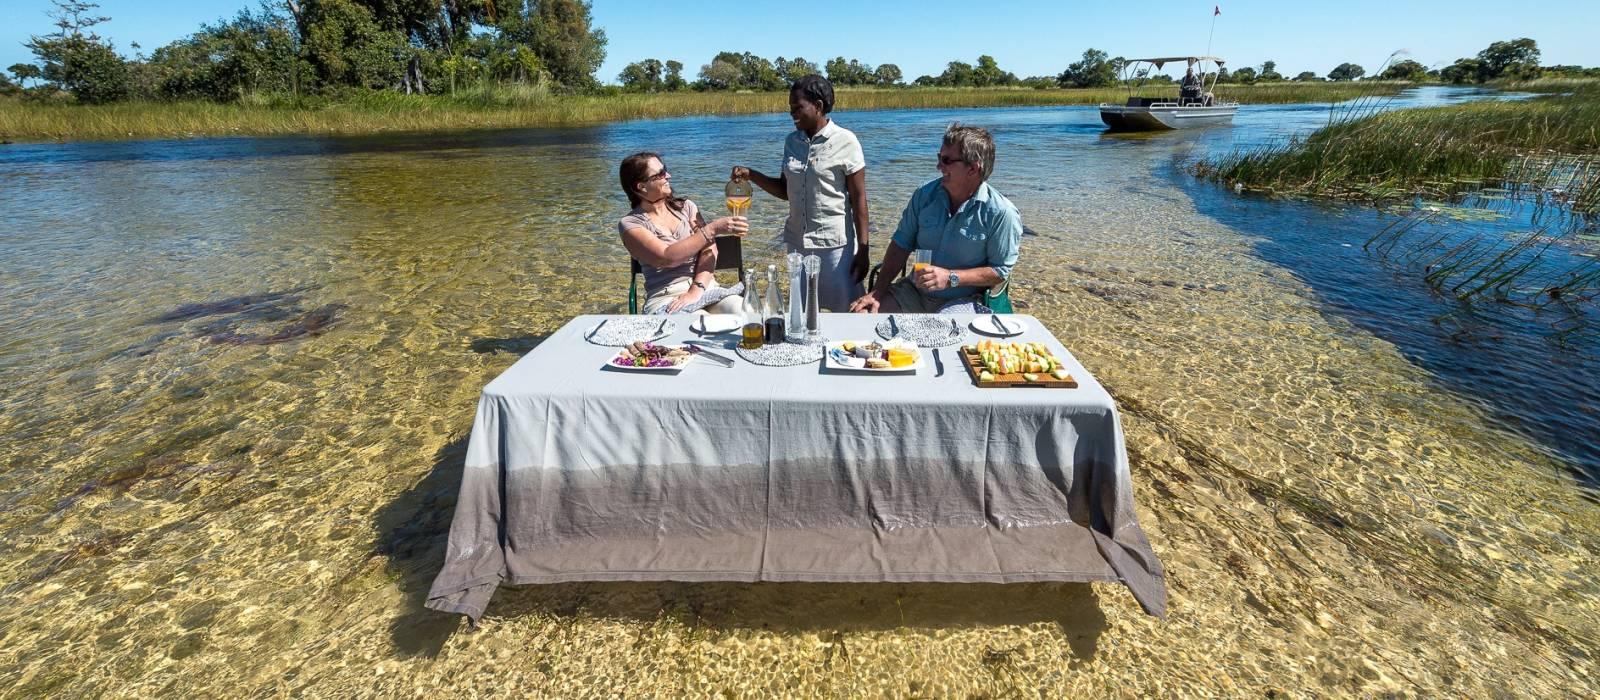 Enchanting Travels Botswana Tours Okavango Hotels Pelo Camp (2)